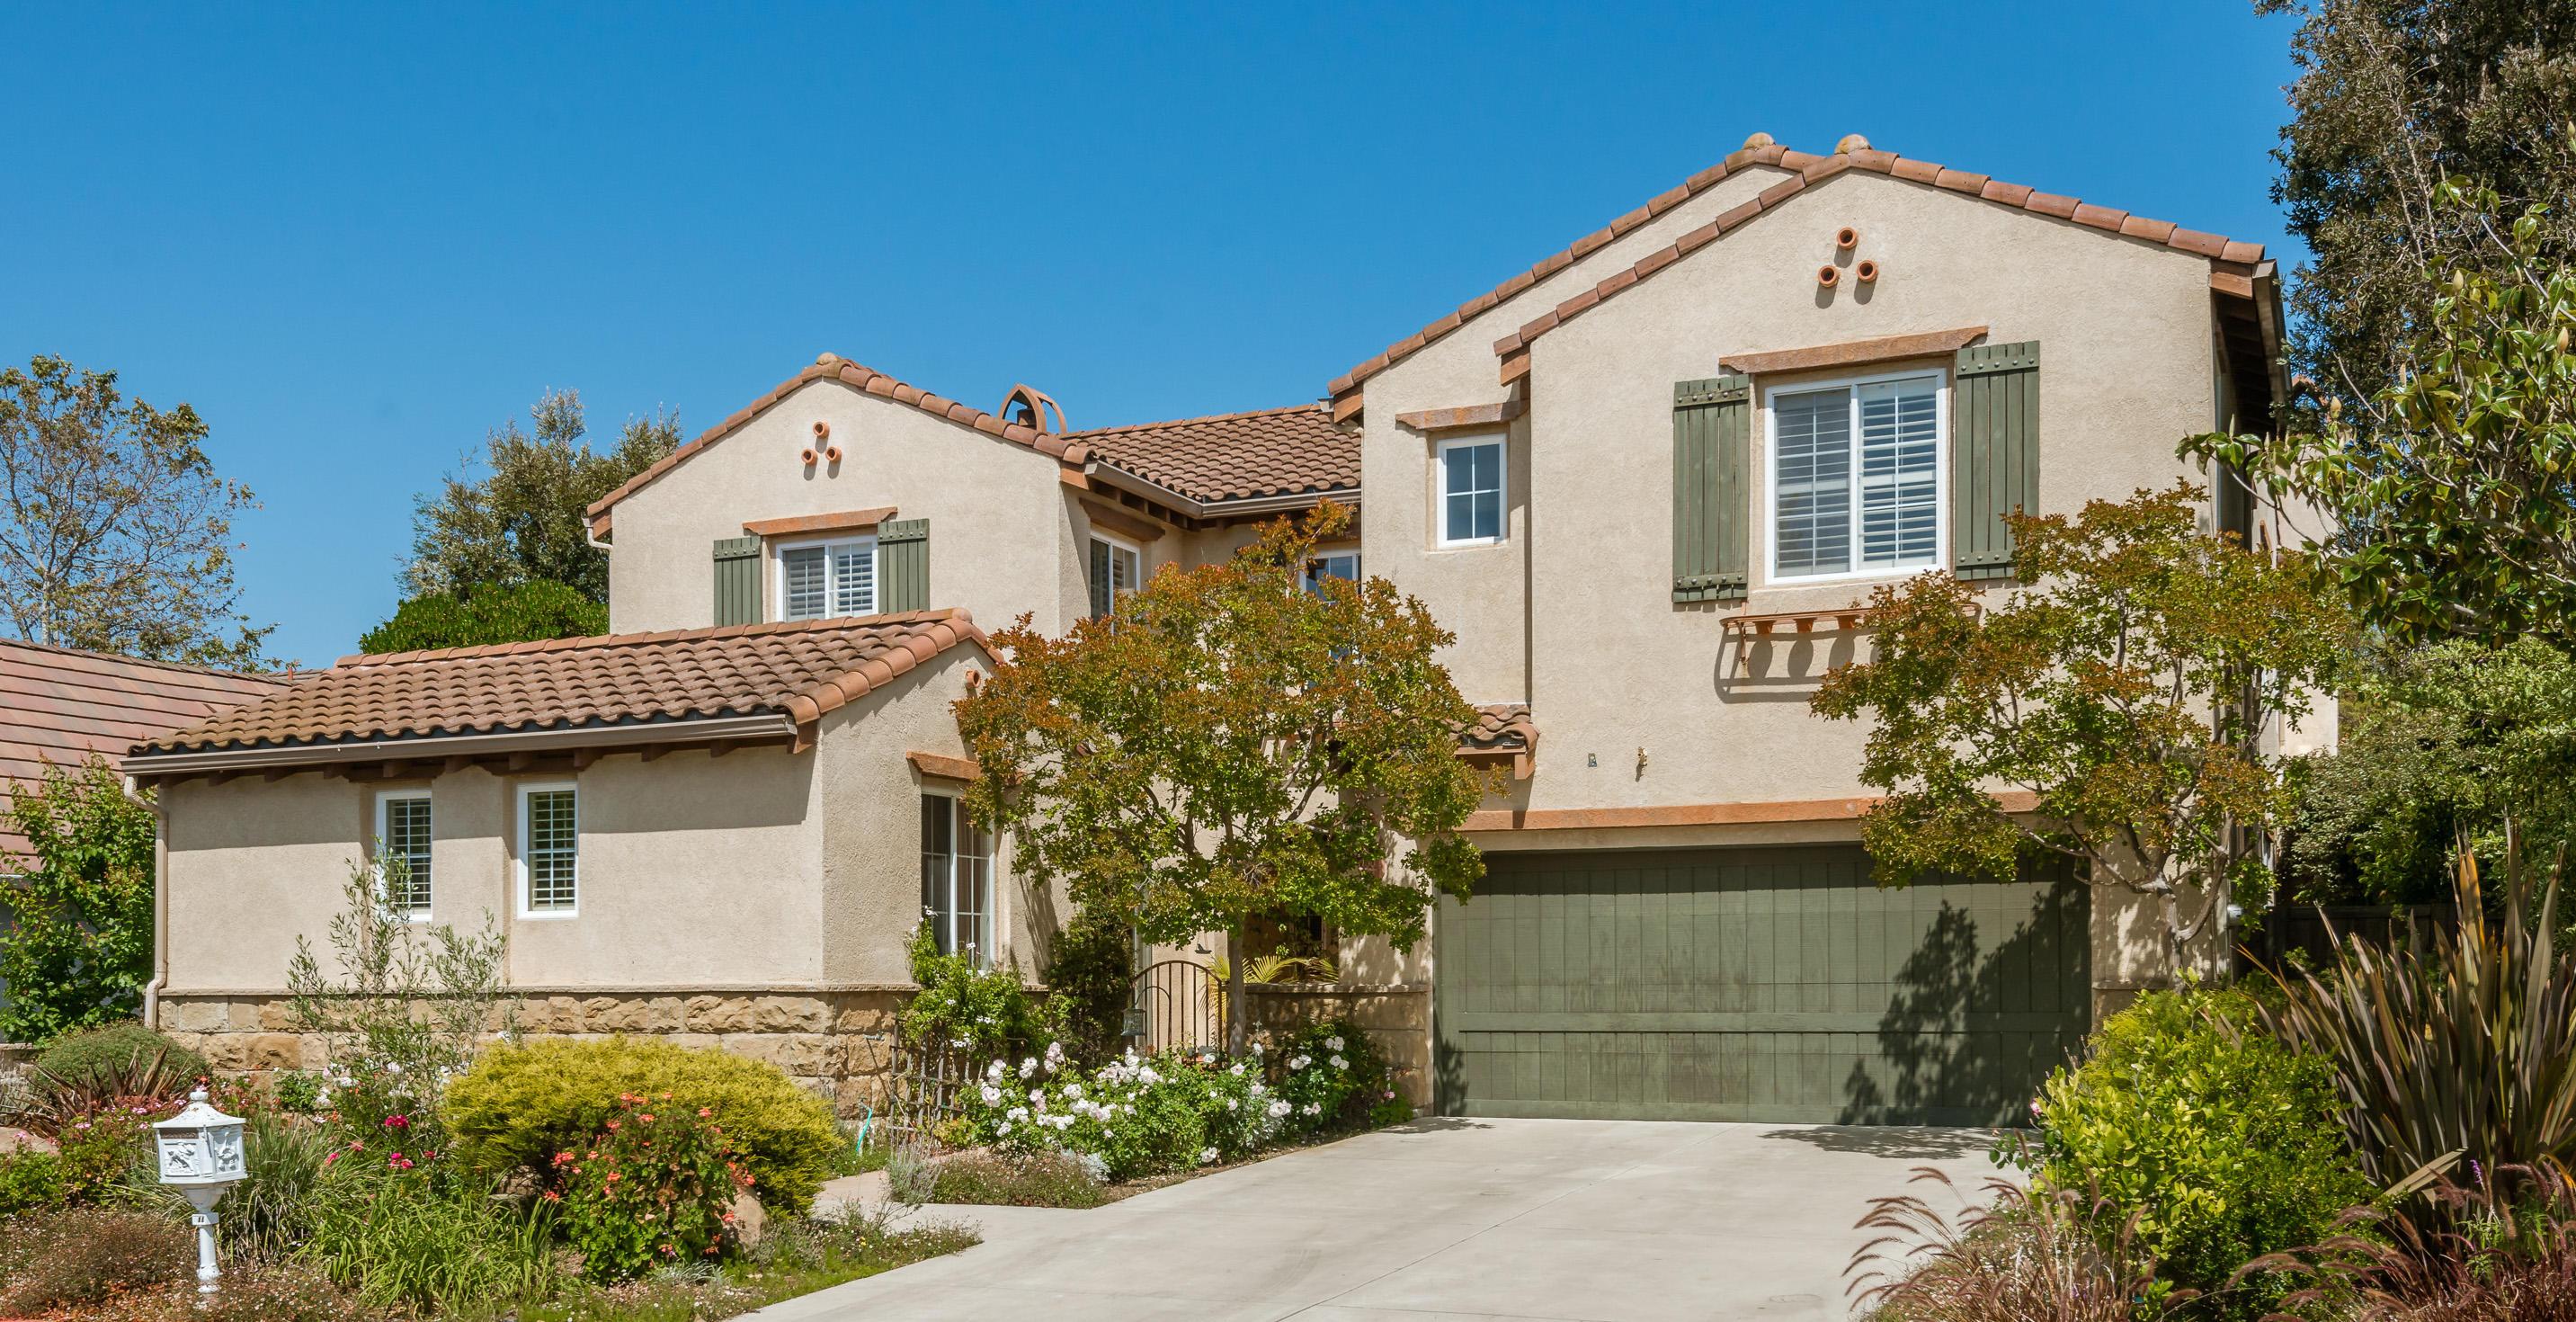 Property photo for 288 Royal Linda Dr Goleta, California 93117 - 17-1640